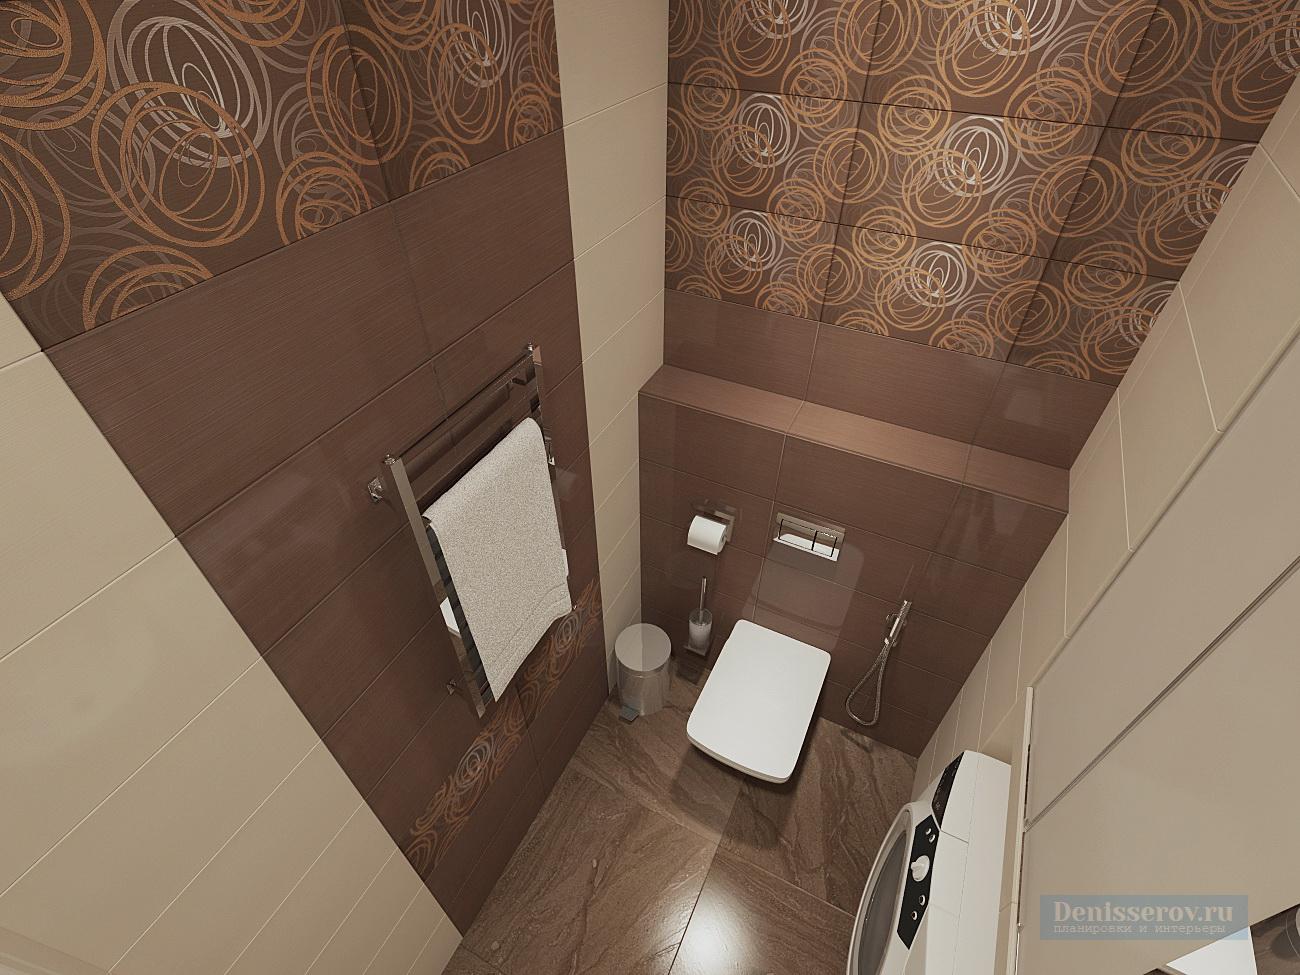 Dizajn-tualet-2-kv-m-v-korichnevom-cvete-3